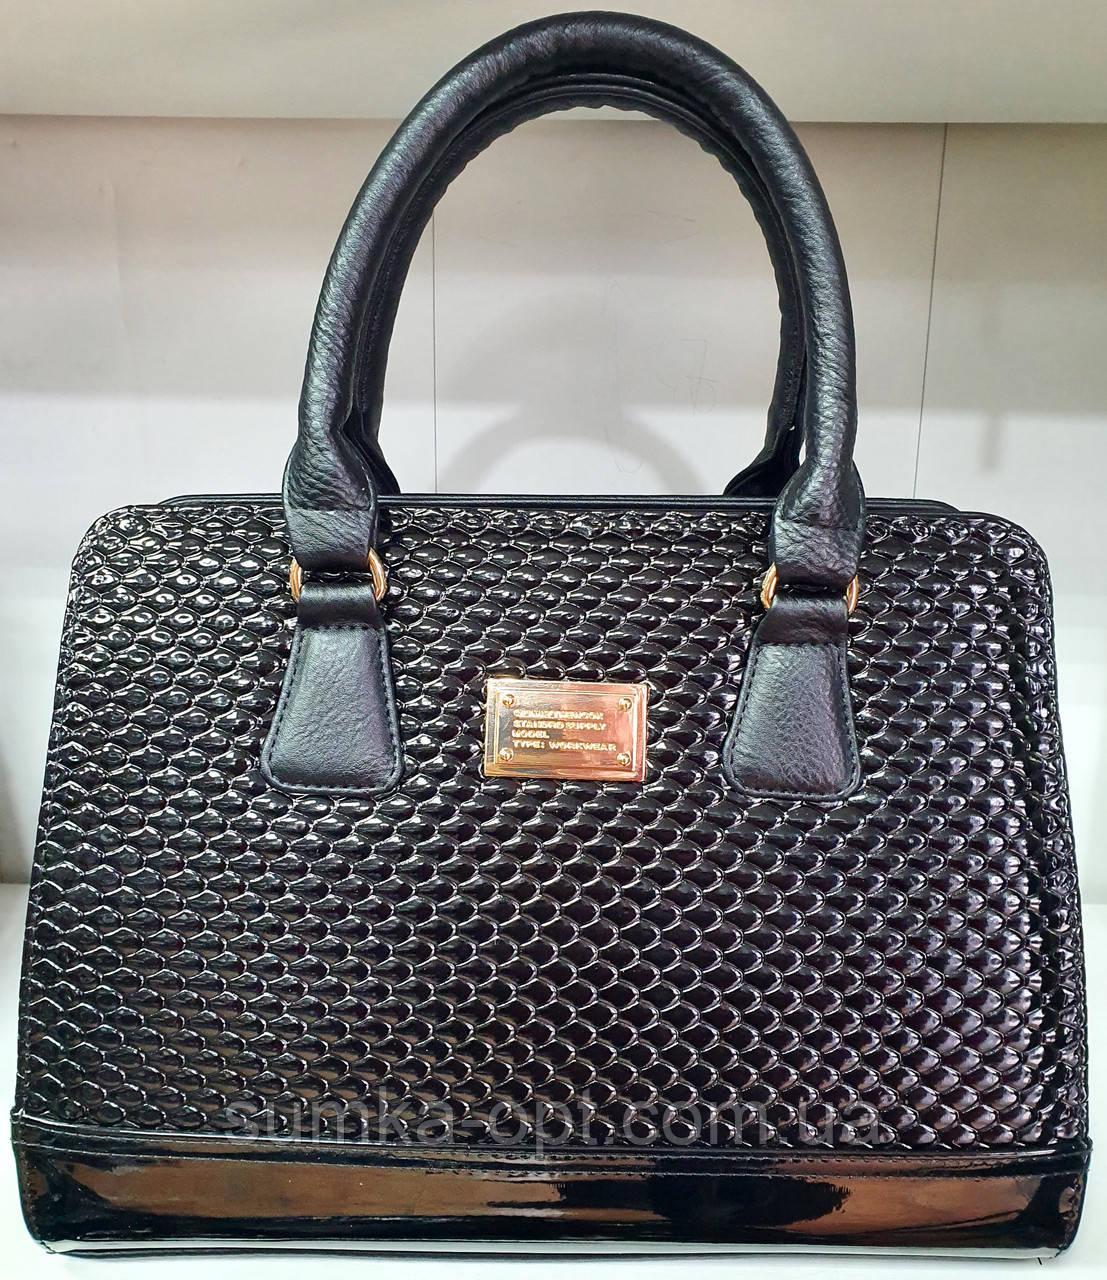 Женская каркасная сумка 33*24 см, черная змея